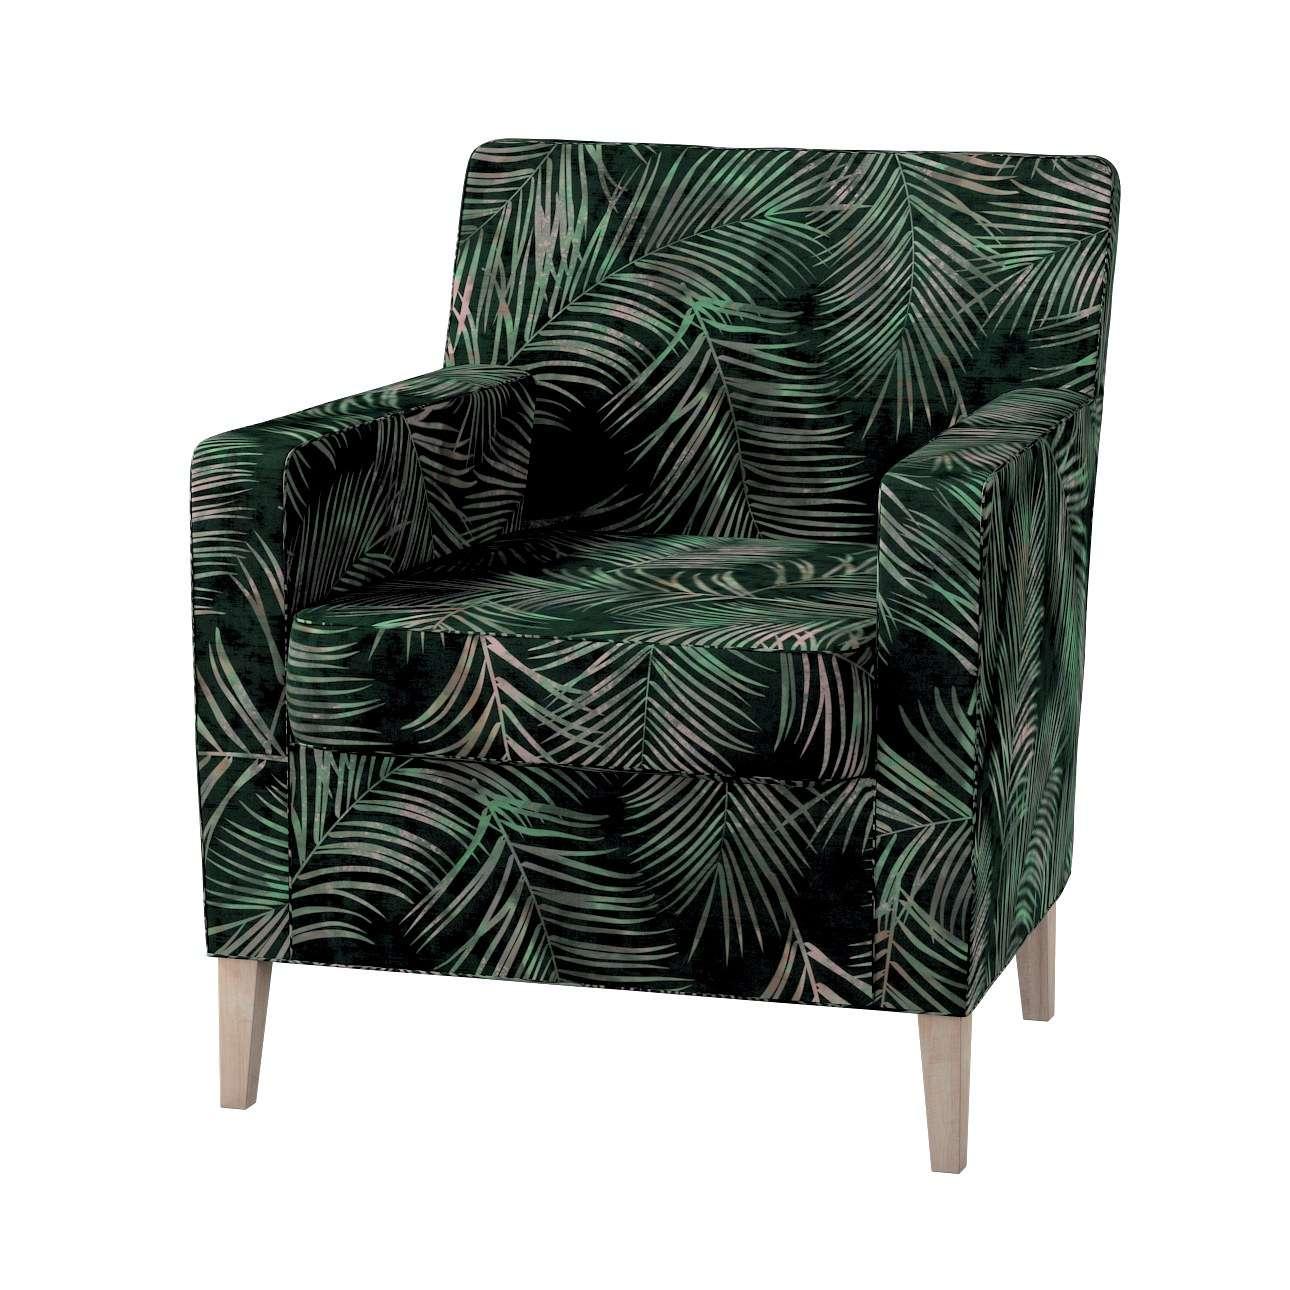 Pokrowiec na fotel Karlstad w kolekcji Velvet, tkanina: 704-21